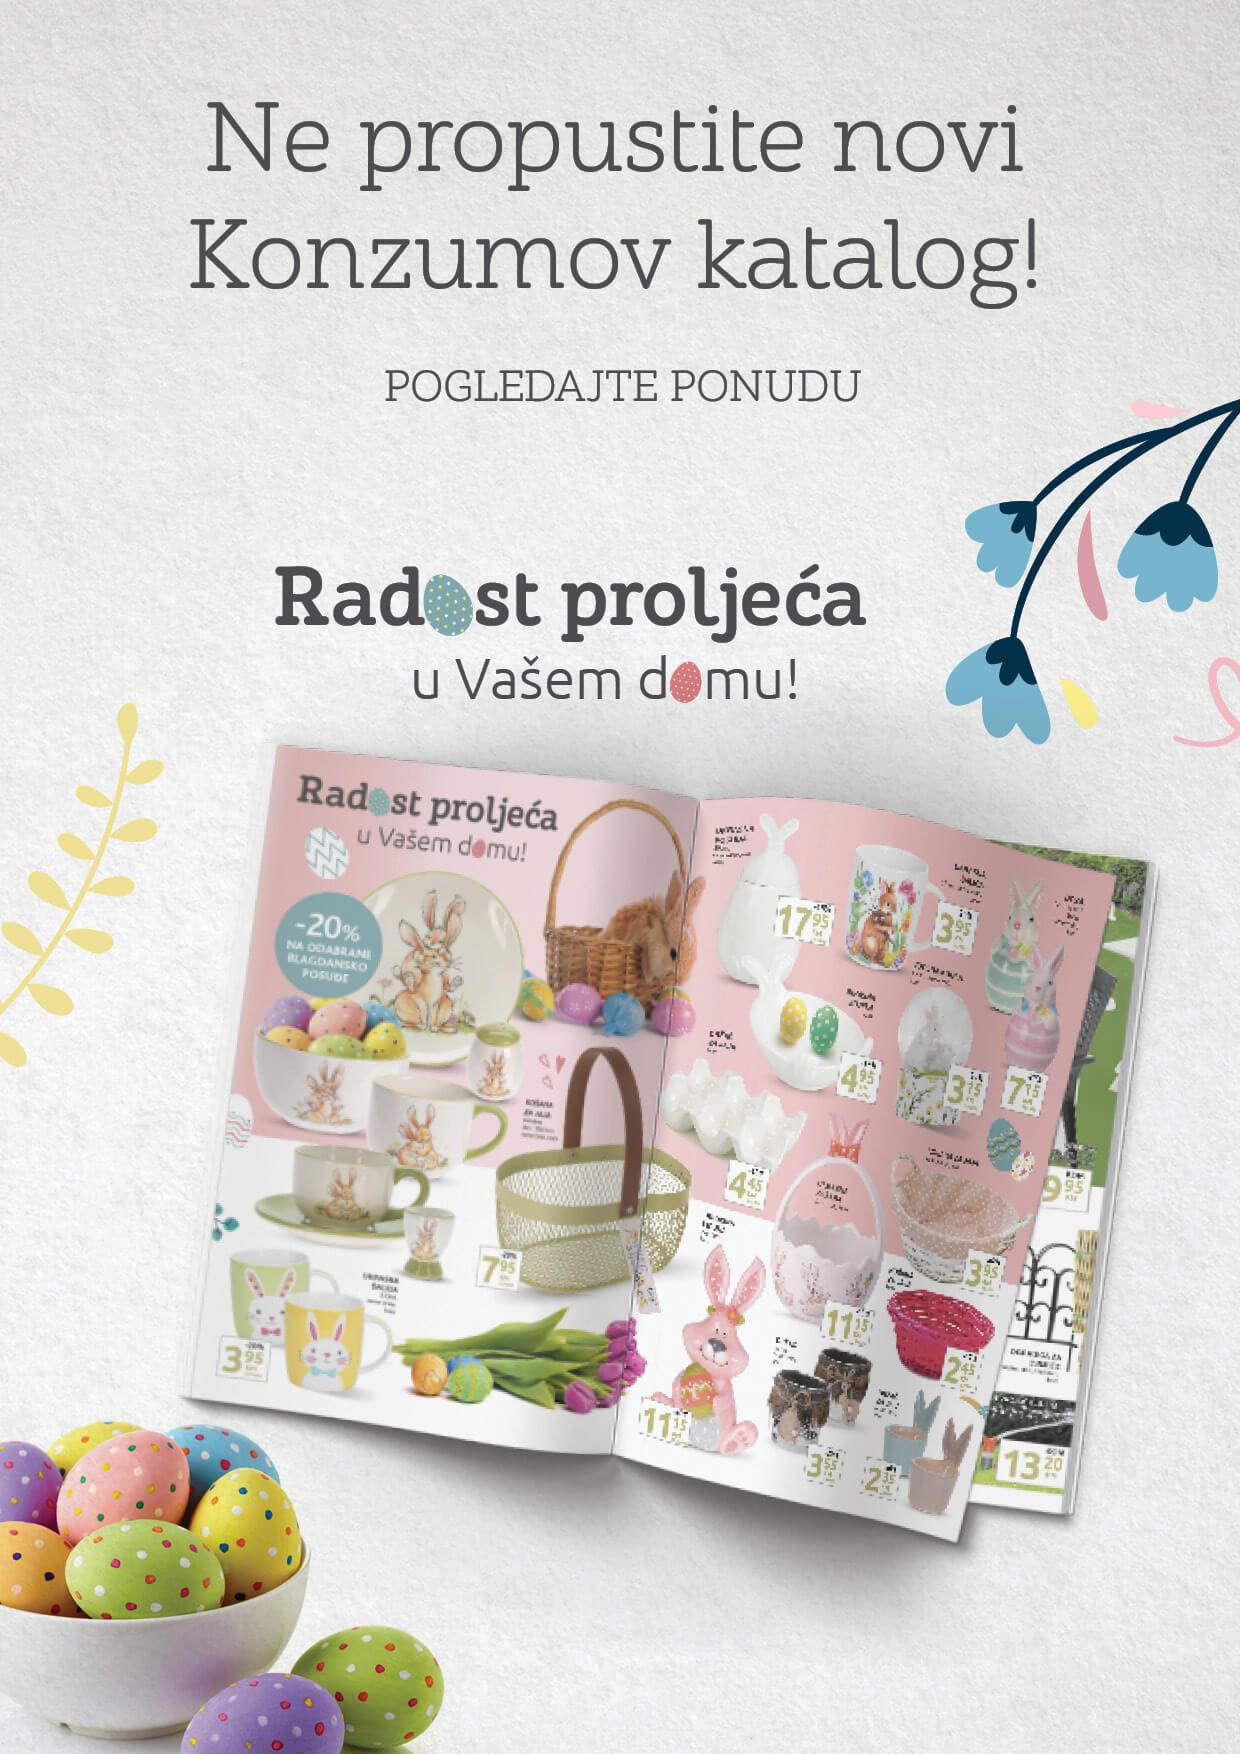 KONZUM Katalog Redovni katalog April 2021 29.03.2021. 08.04.2021. Page 27